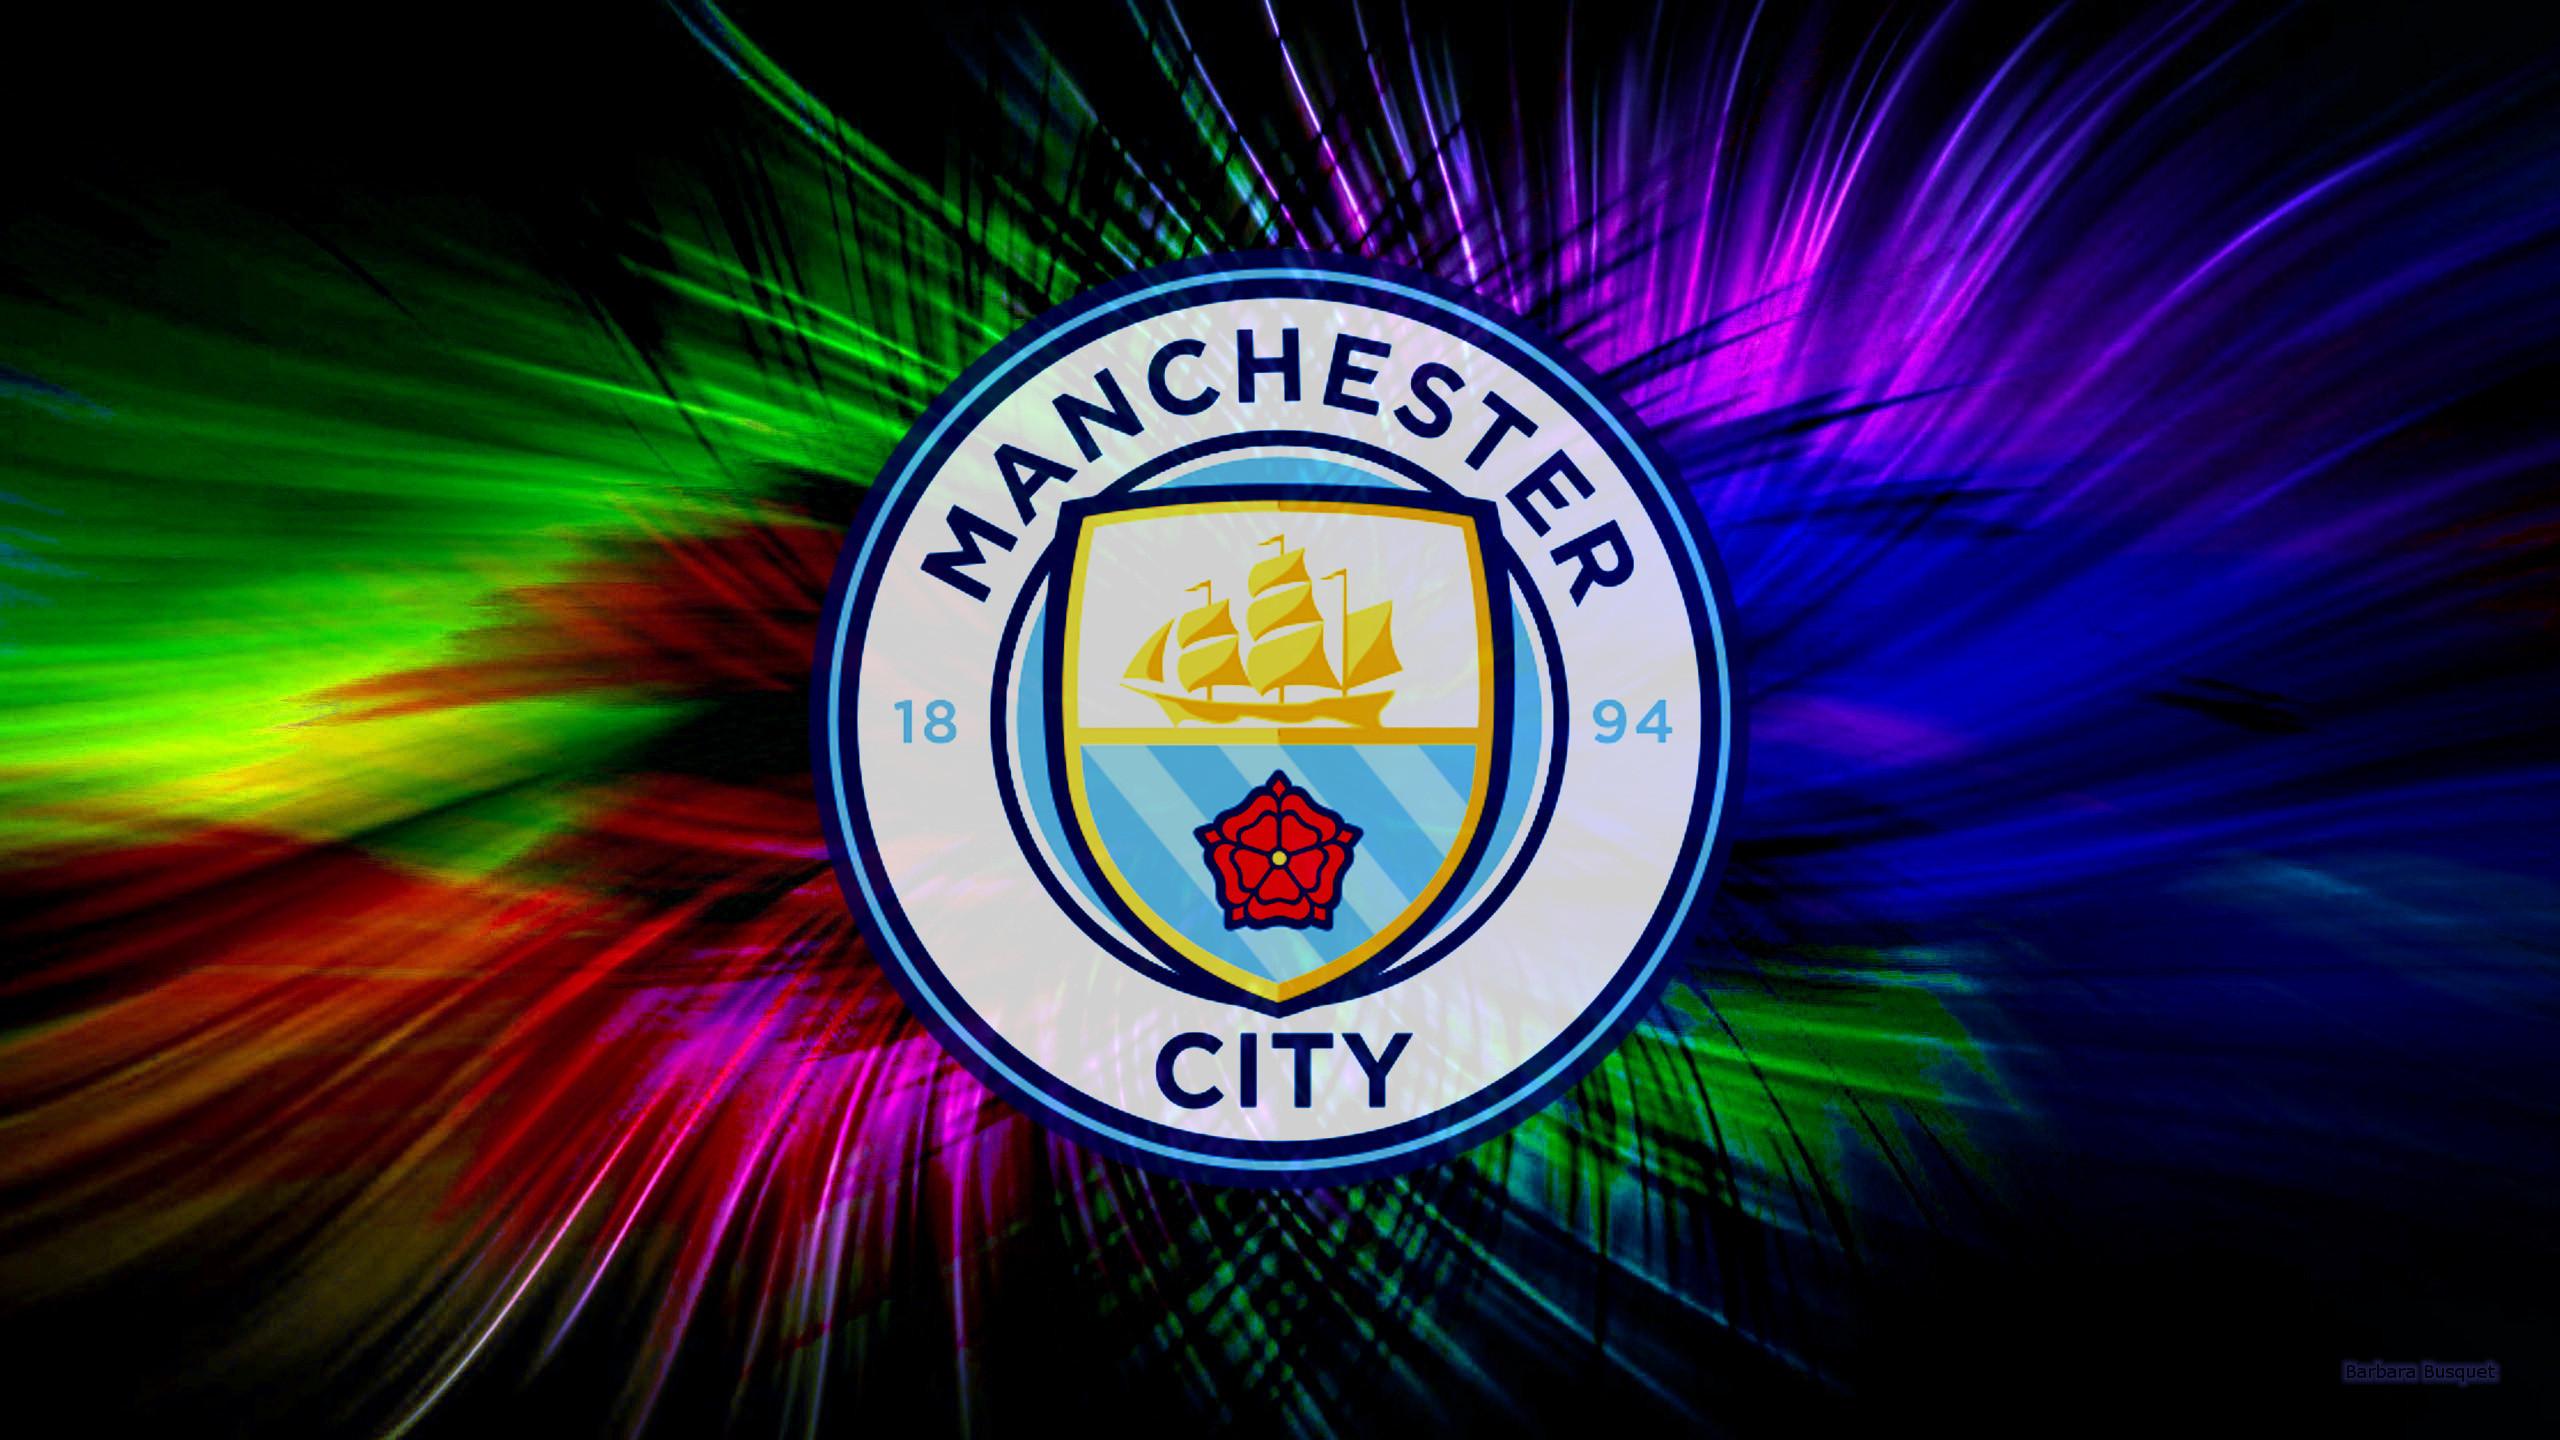 Manchester City Wallpaper: Manchester City IPhone Wallpaper (74+ Images